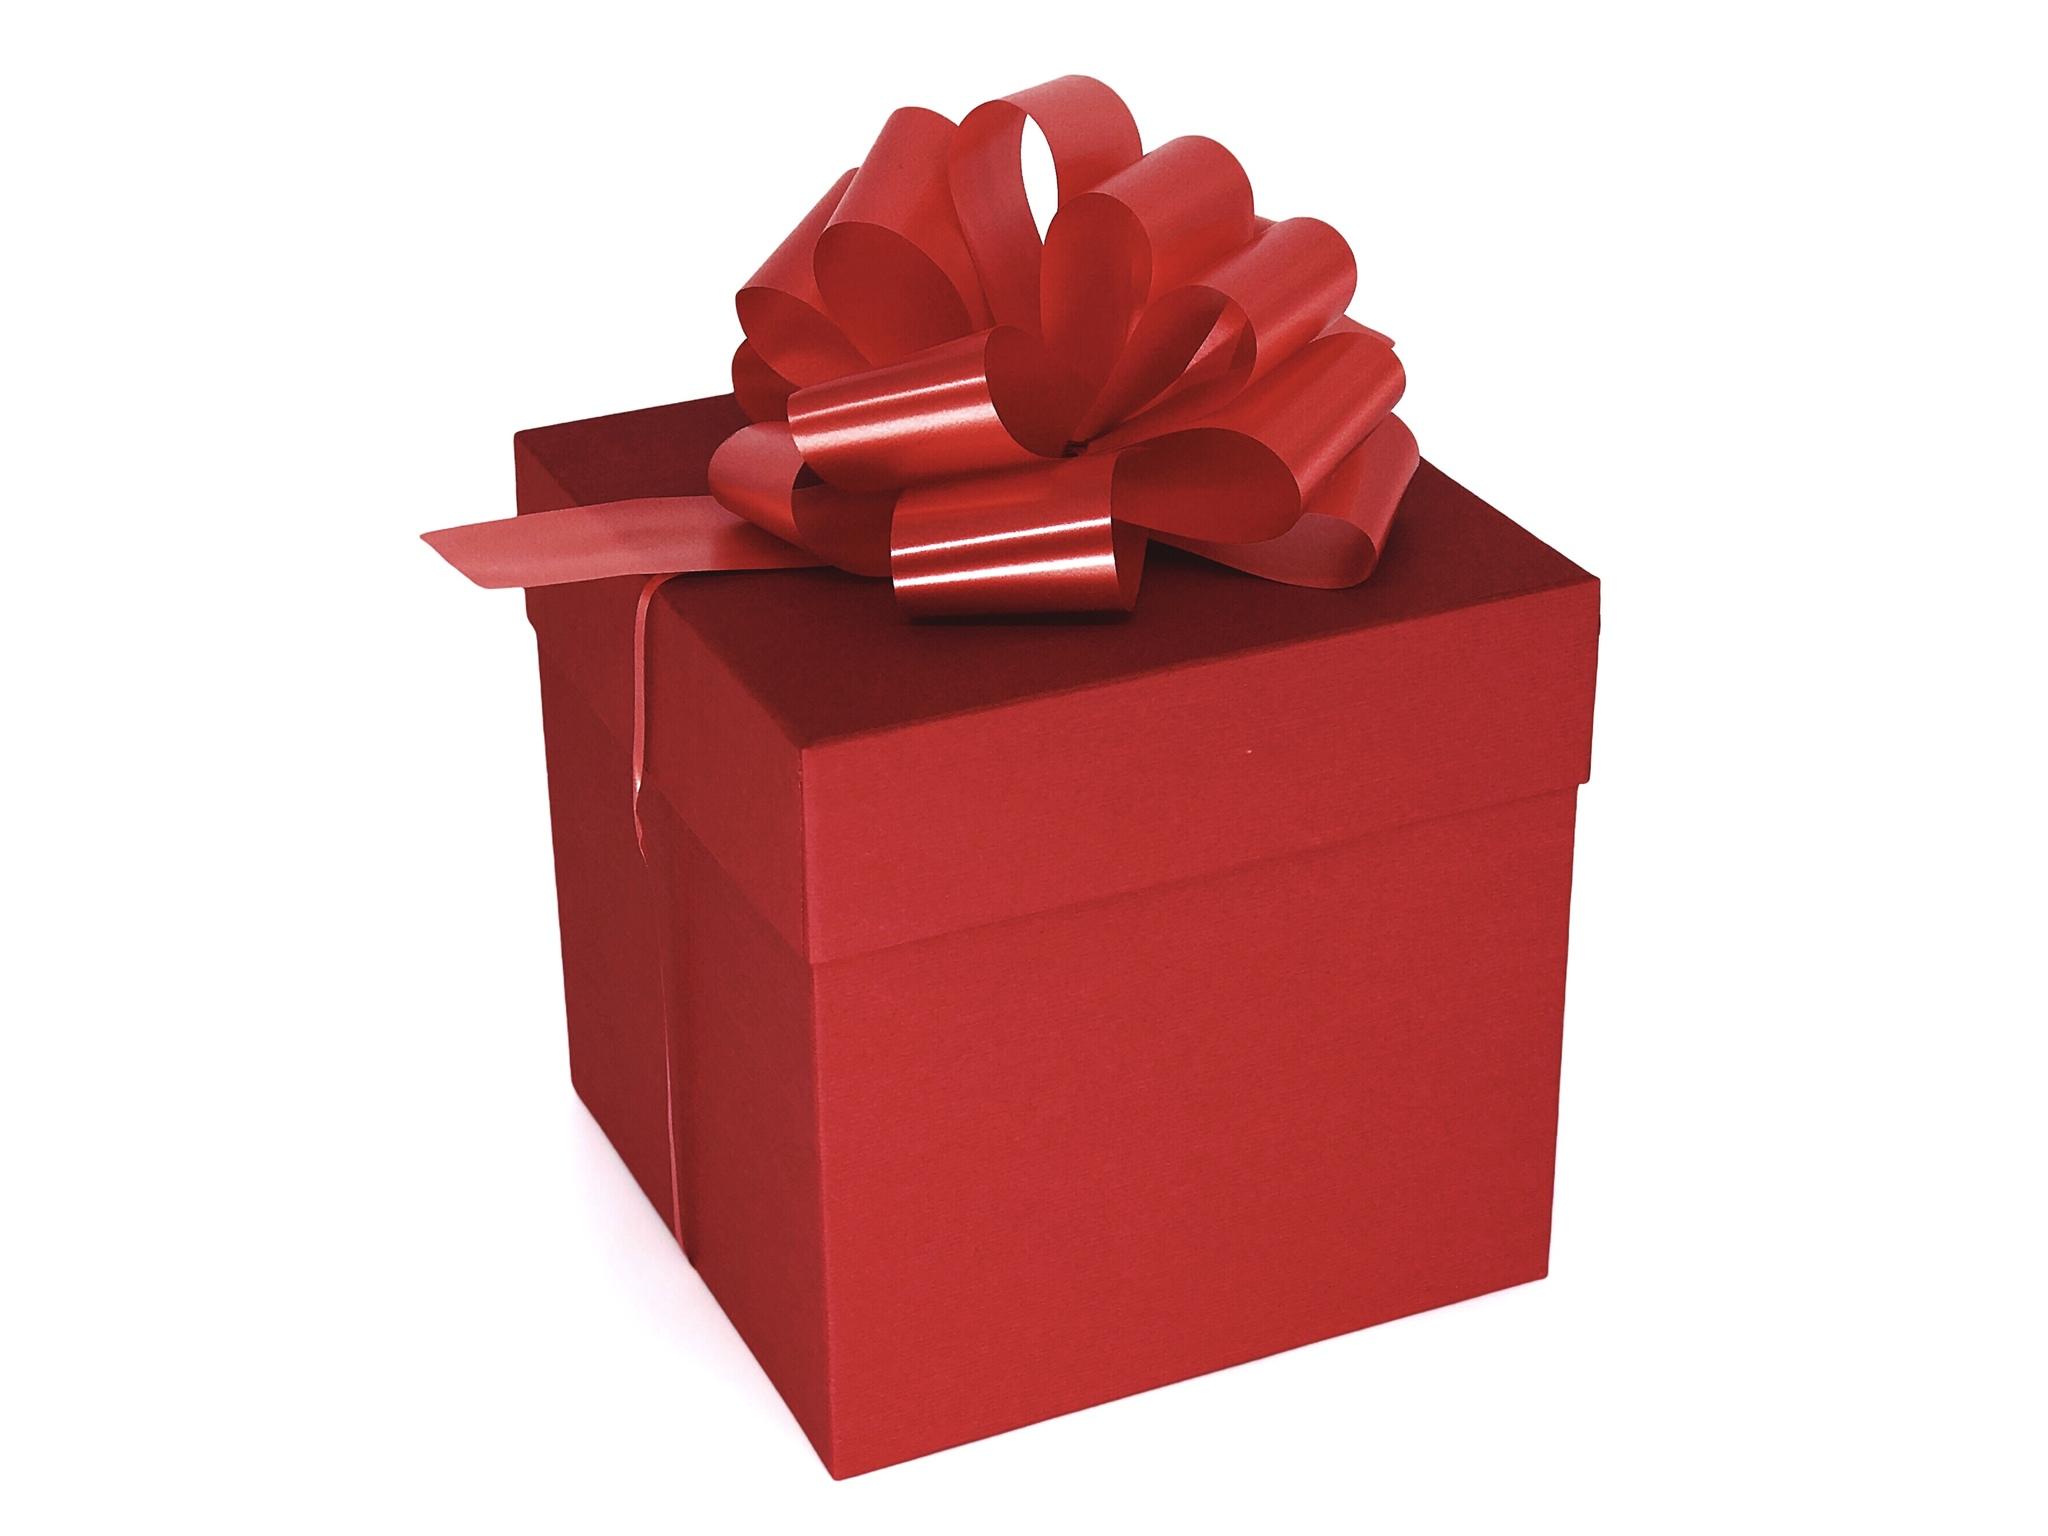 бантик картинка коробка красная обыкновенная фото